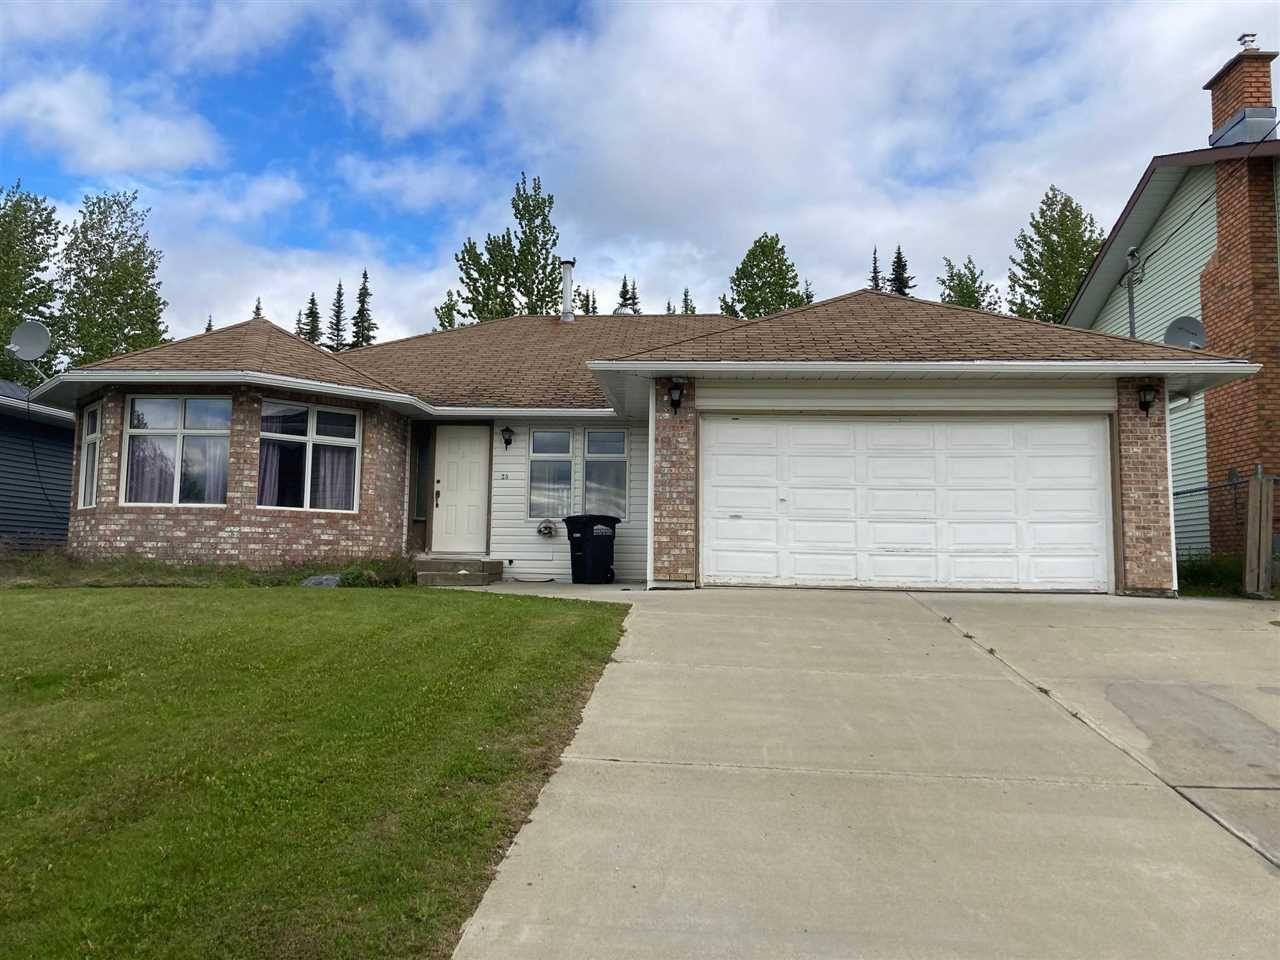 Main Photo: 25 MCINTYRE Drive in Mackenzie: Mackenzie -Town House for sale (Mackenzie (Zone 69))  : MLS®# R2587118